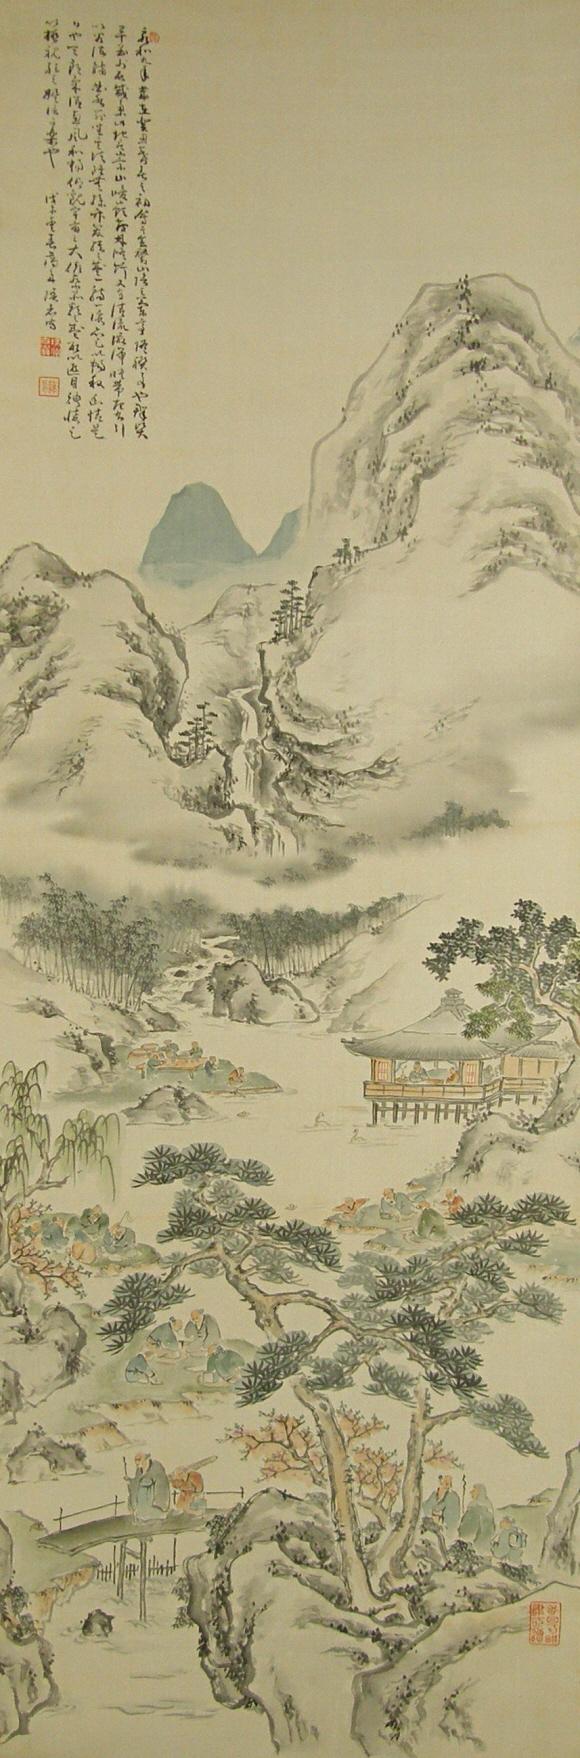 580x1758 Ss 10184 [ Pleasance Of Sages ] Japanese Vintage Landscape